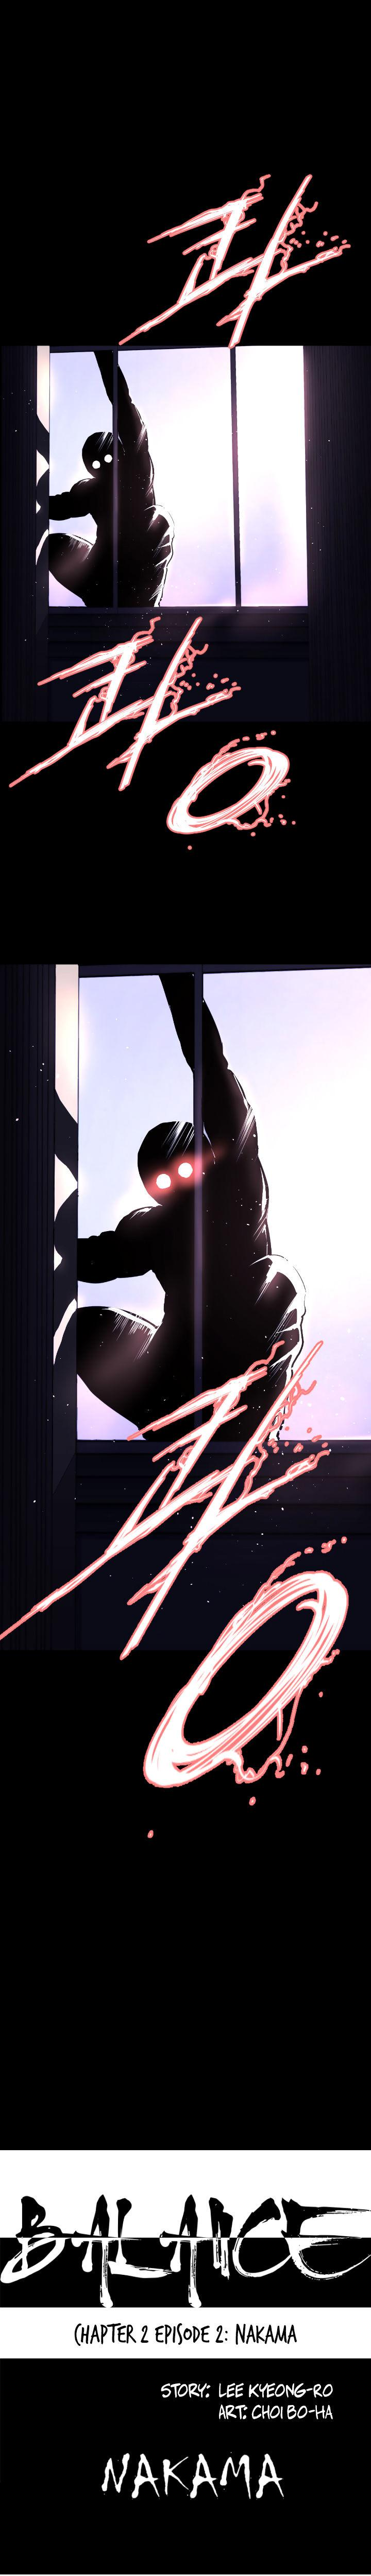 Balance - Chapter 19